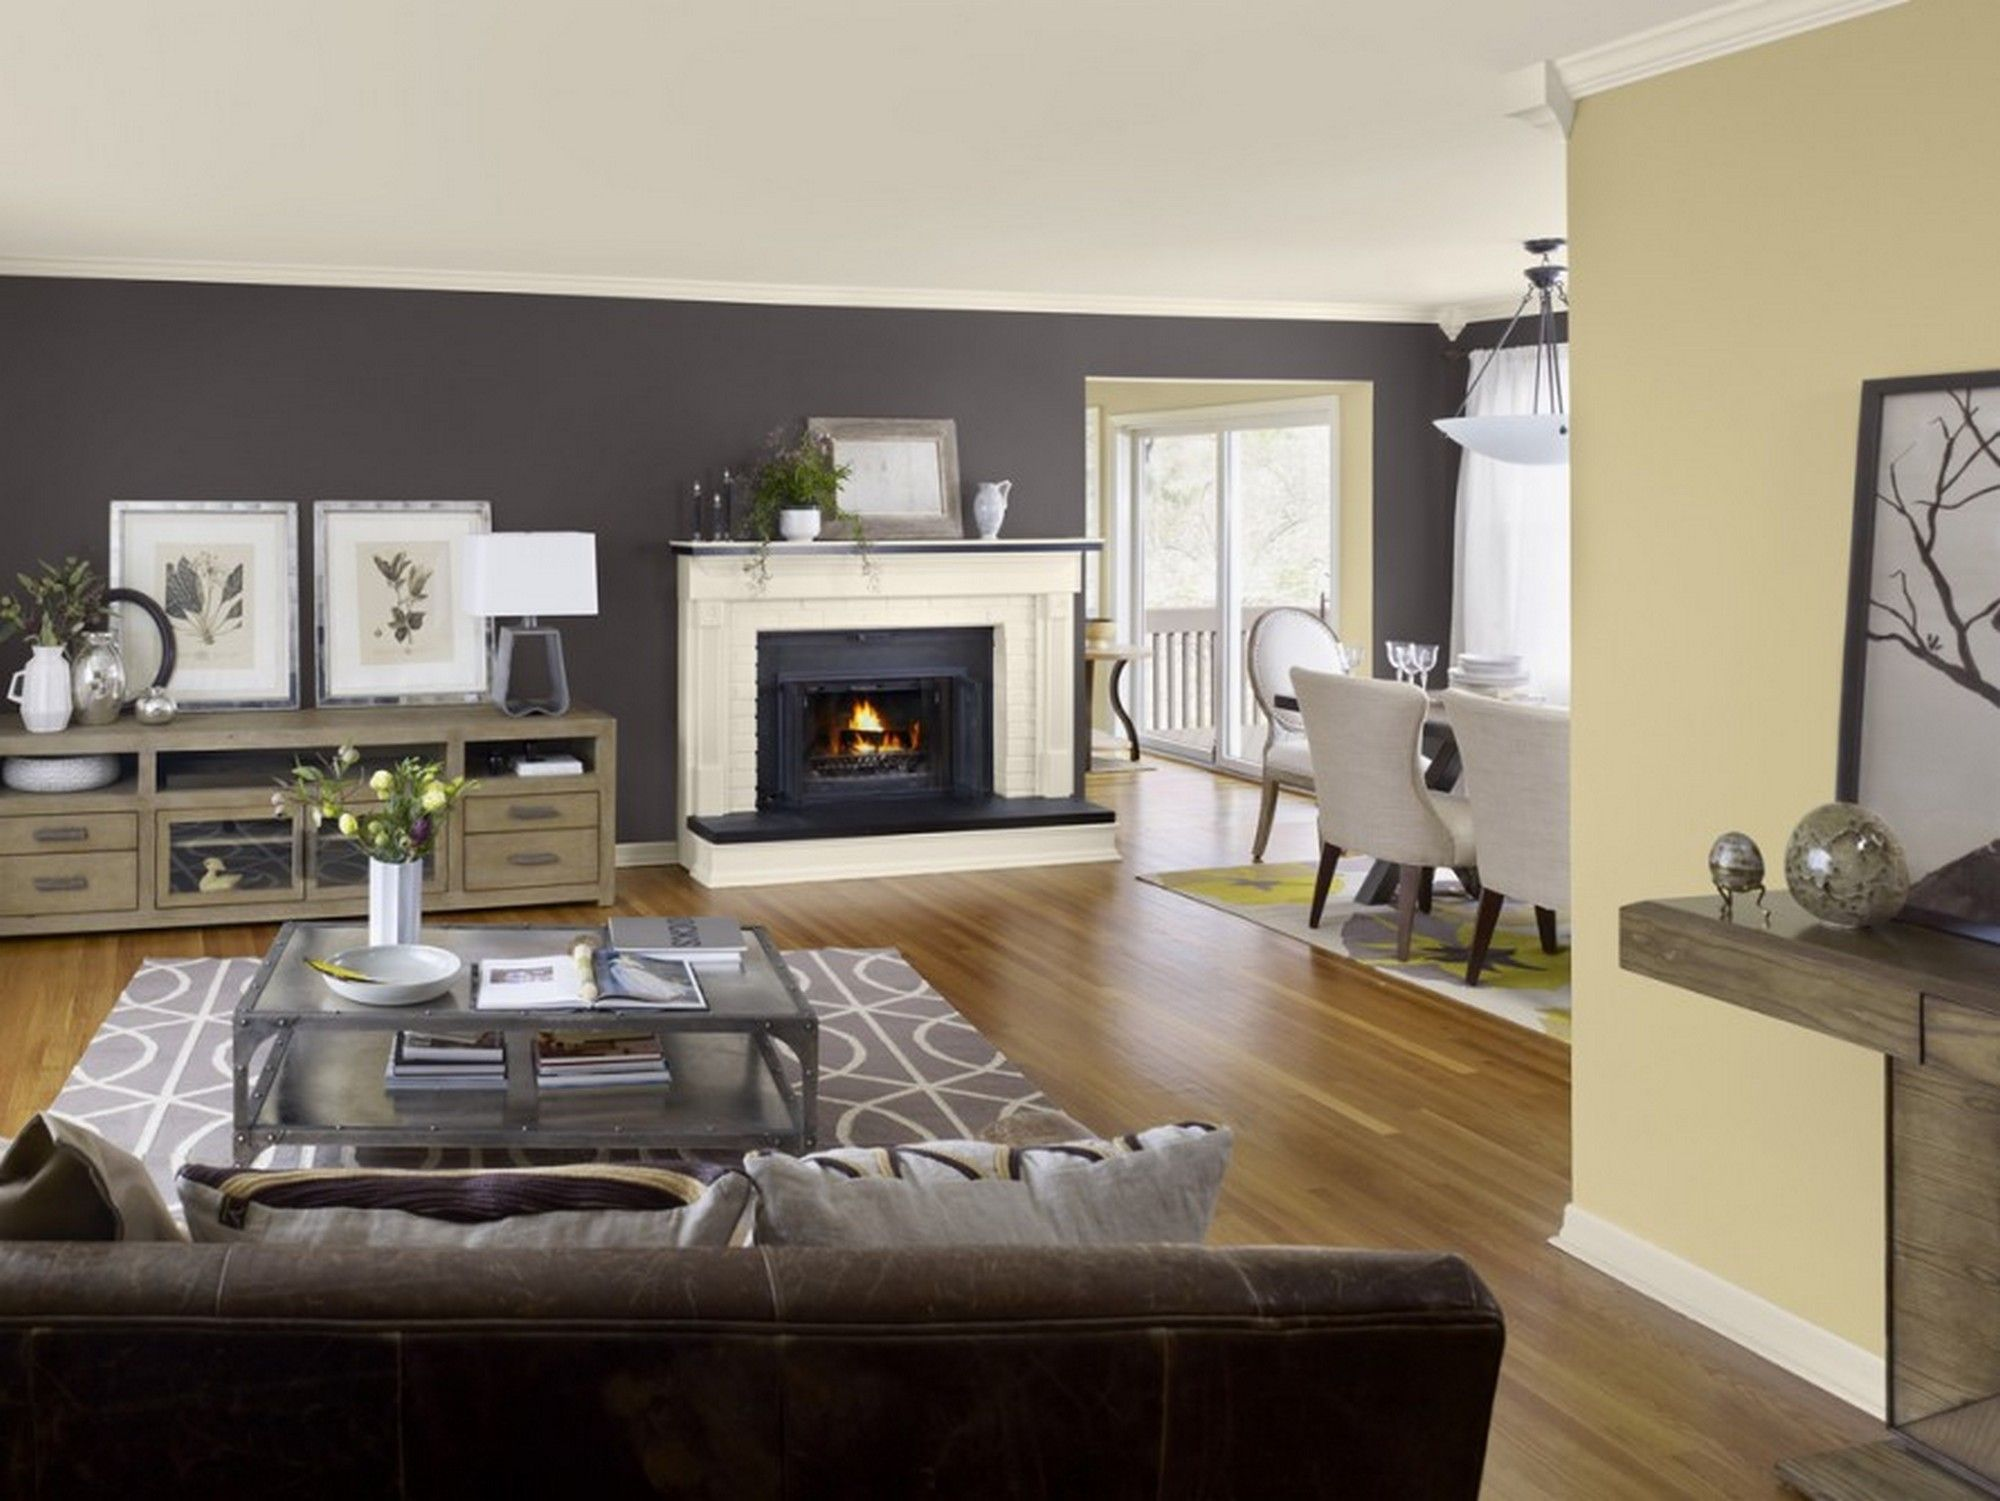 Luxurious Modern Open Floor Plans Design With Dark Brown Sofa